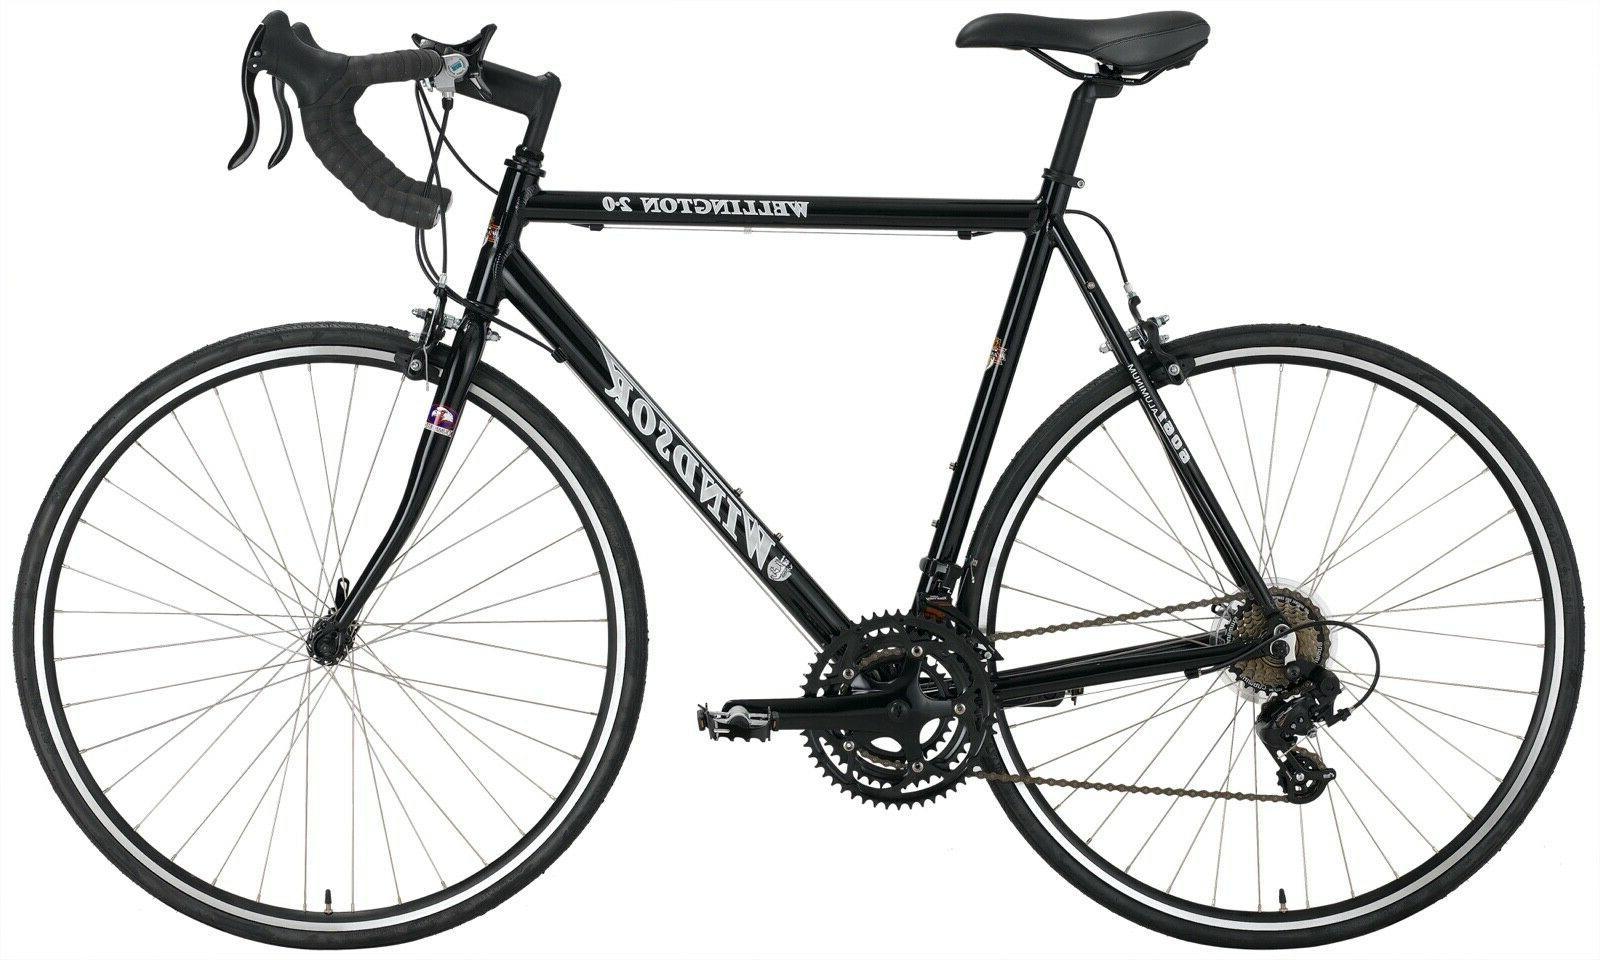 new wellington 2 0 aluminum road bicycle